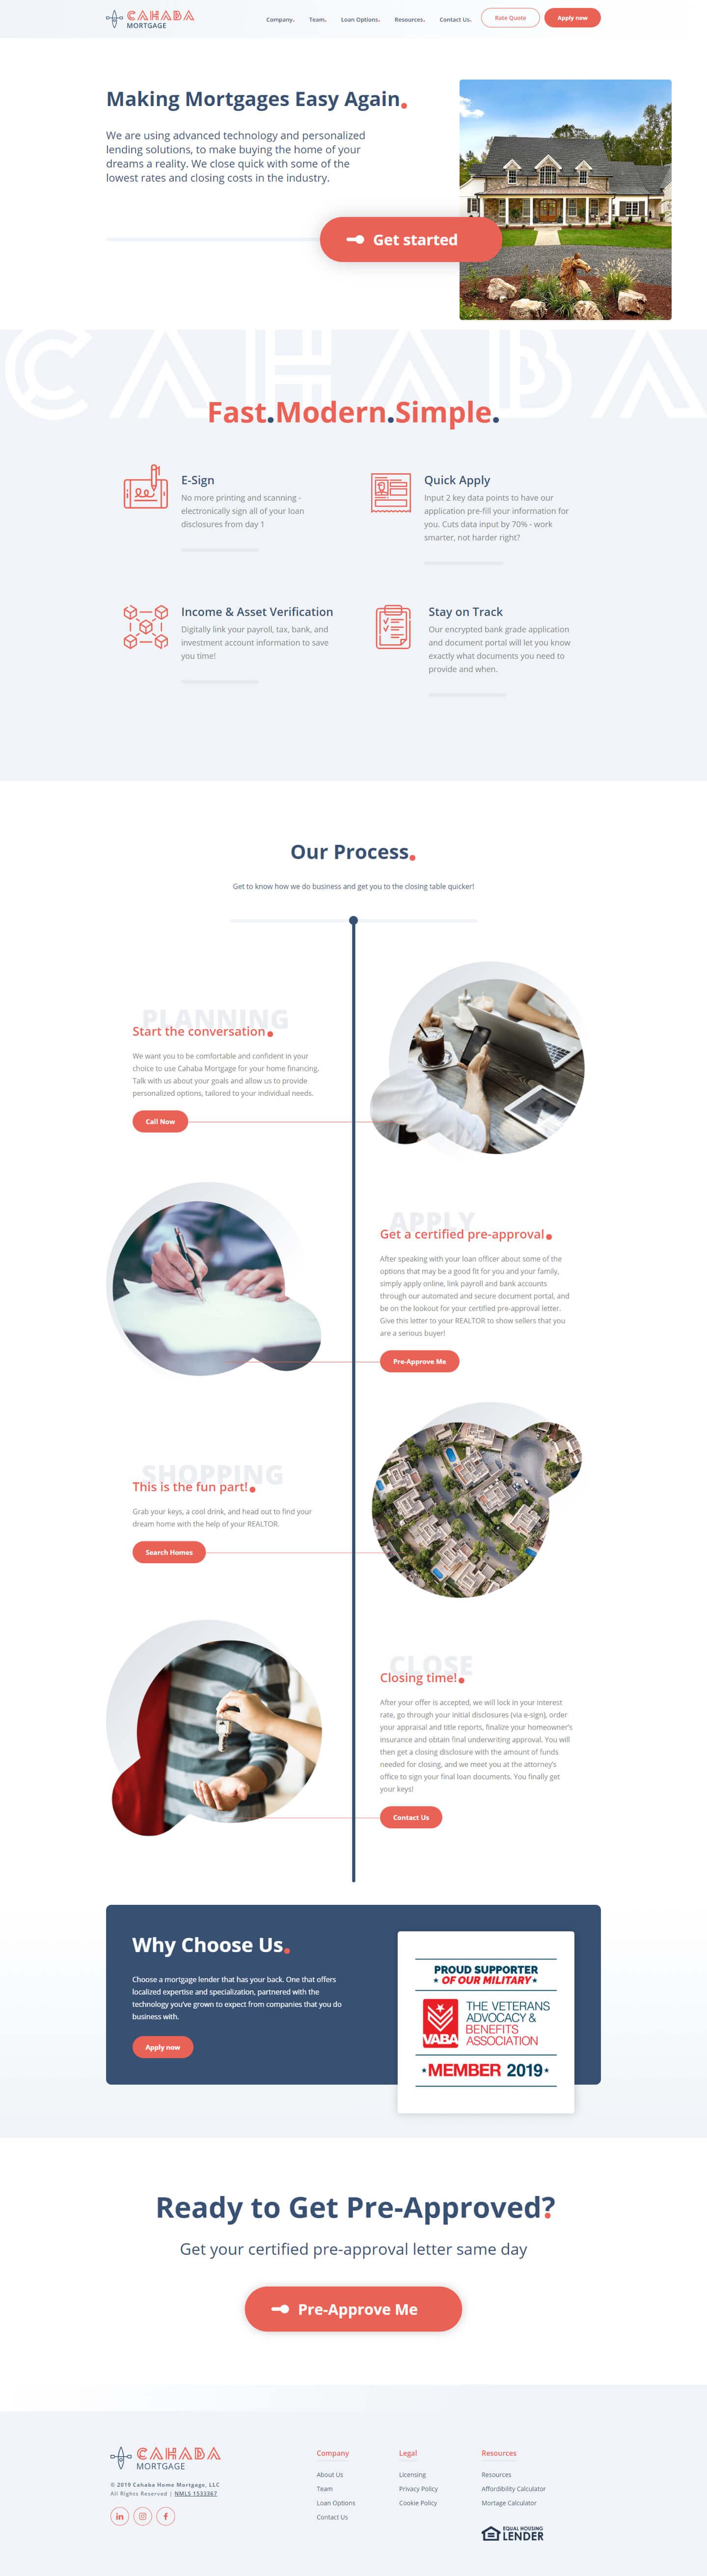 Finsweet Webflow development for Cahaba Mortgage